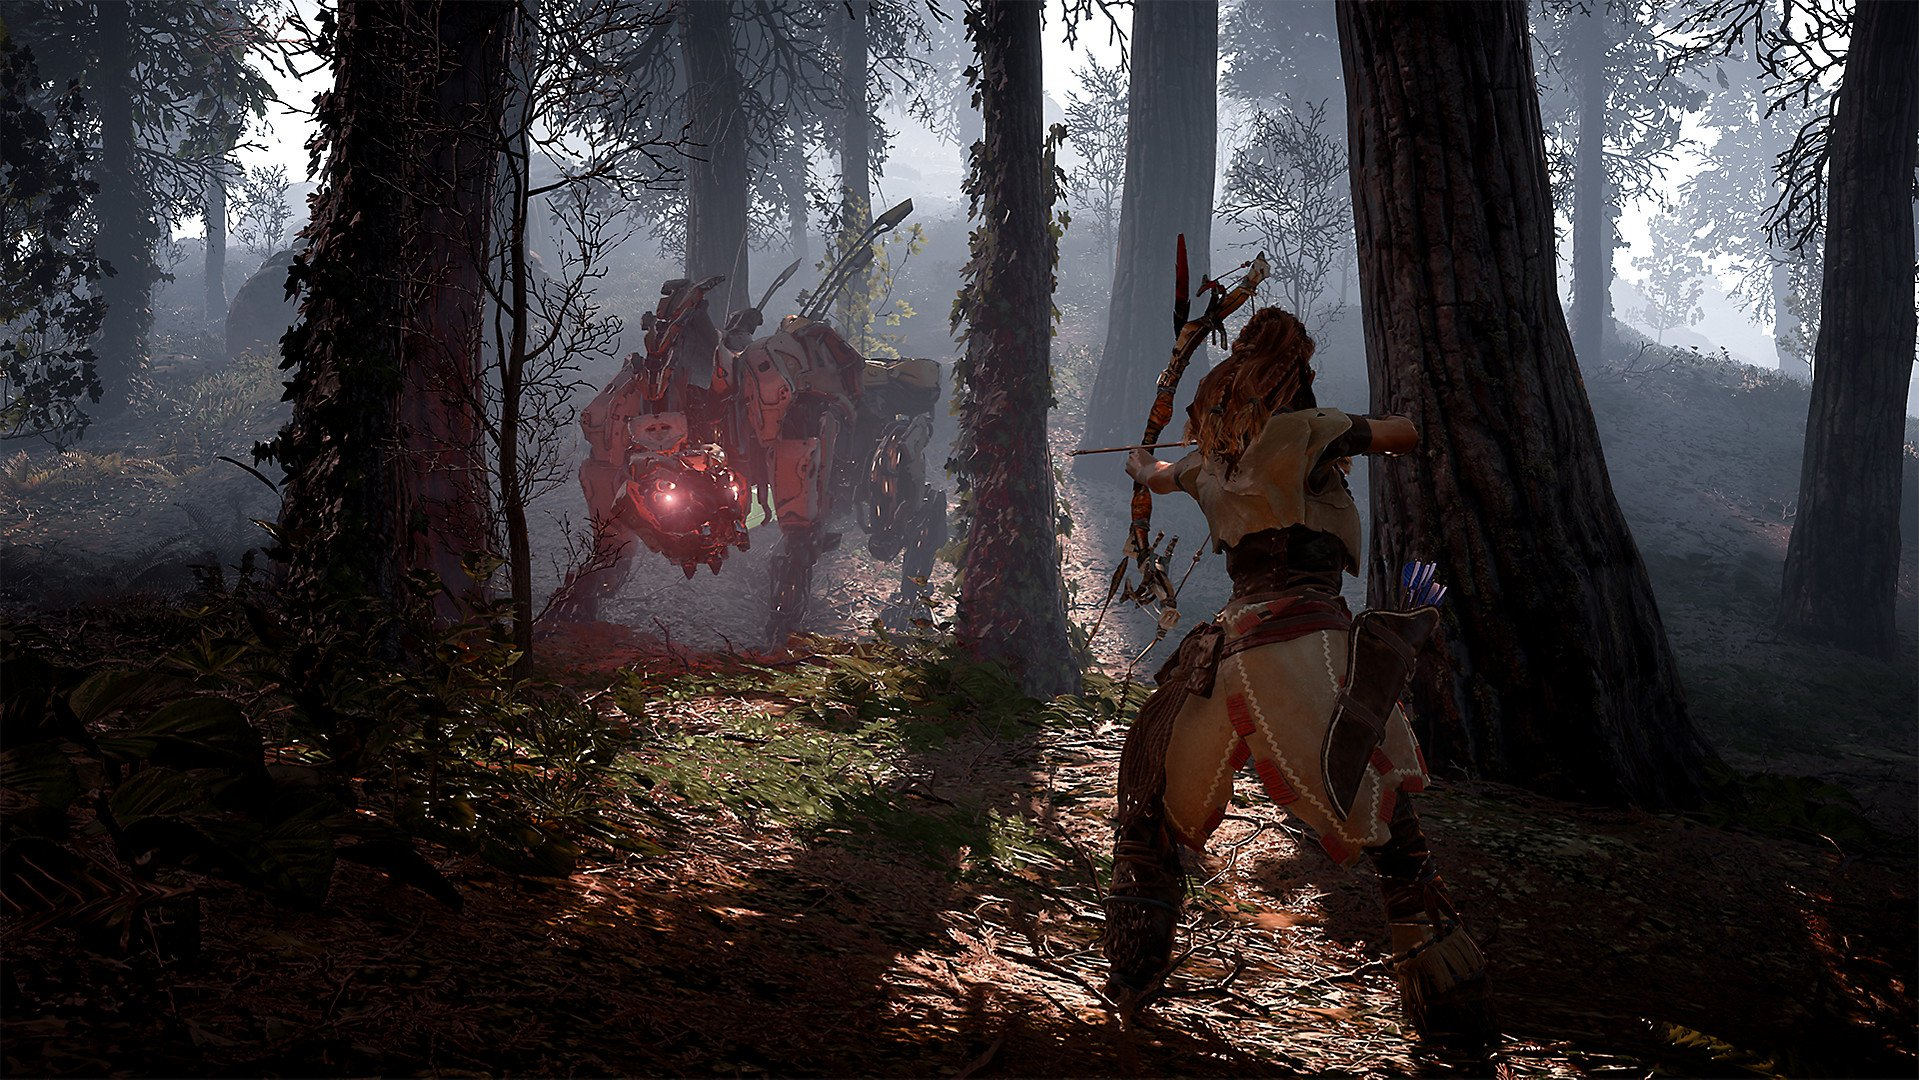 Horizon Zero Dawn is getting a PC release